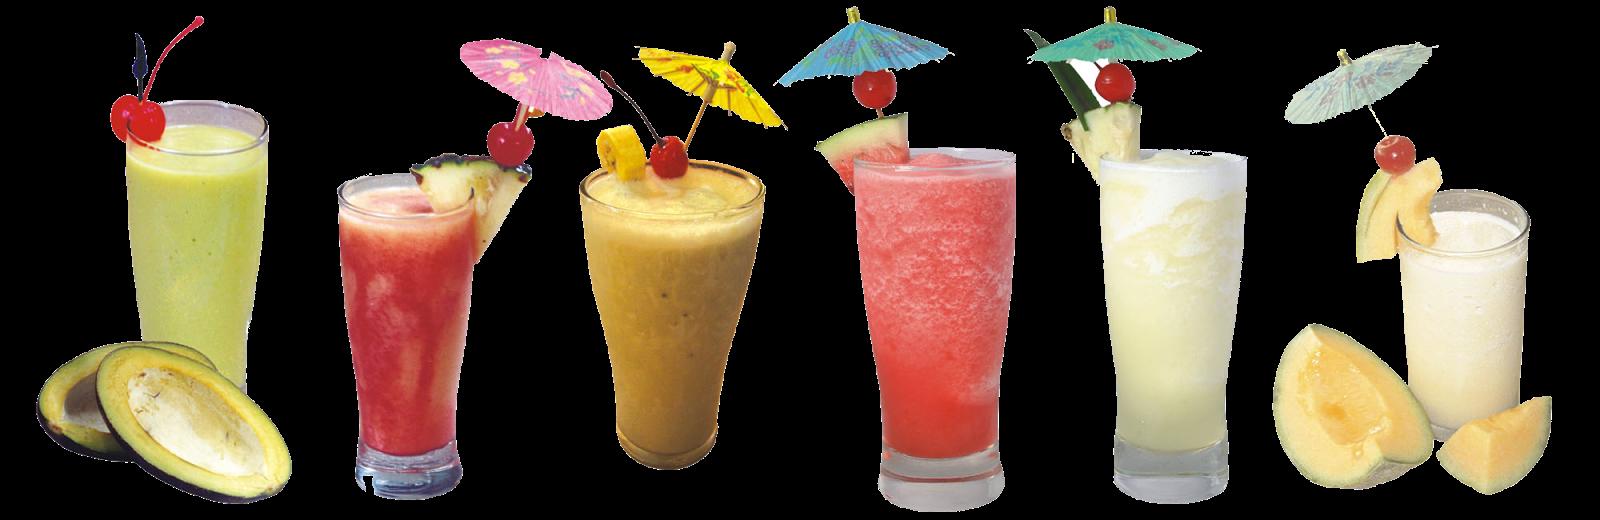 Creative jorice orange juice. Coconut clipart buko shake